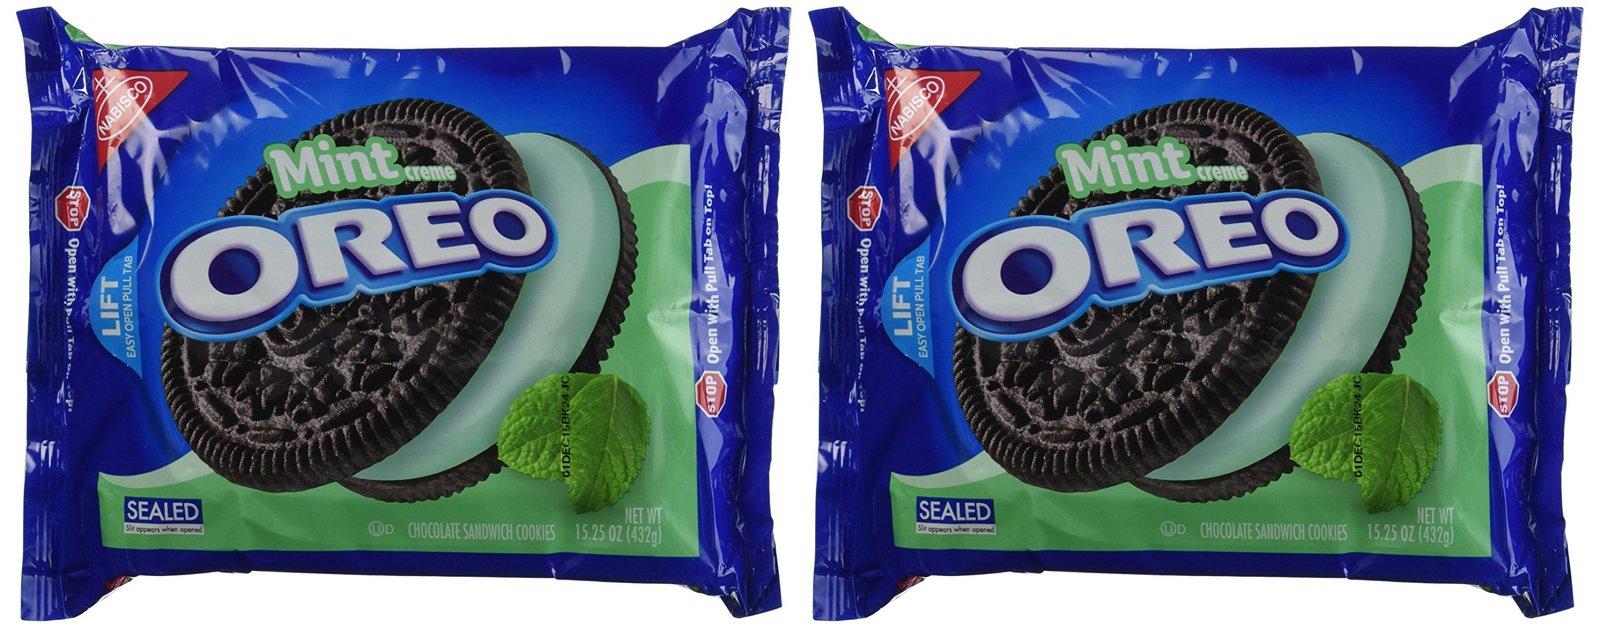 Oreo Chocolate & Cool Mint Creme Sandwich Cookies 15.25 Oz